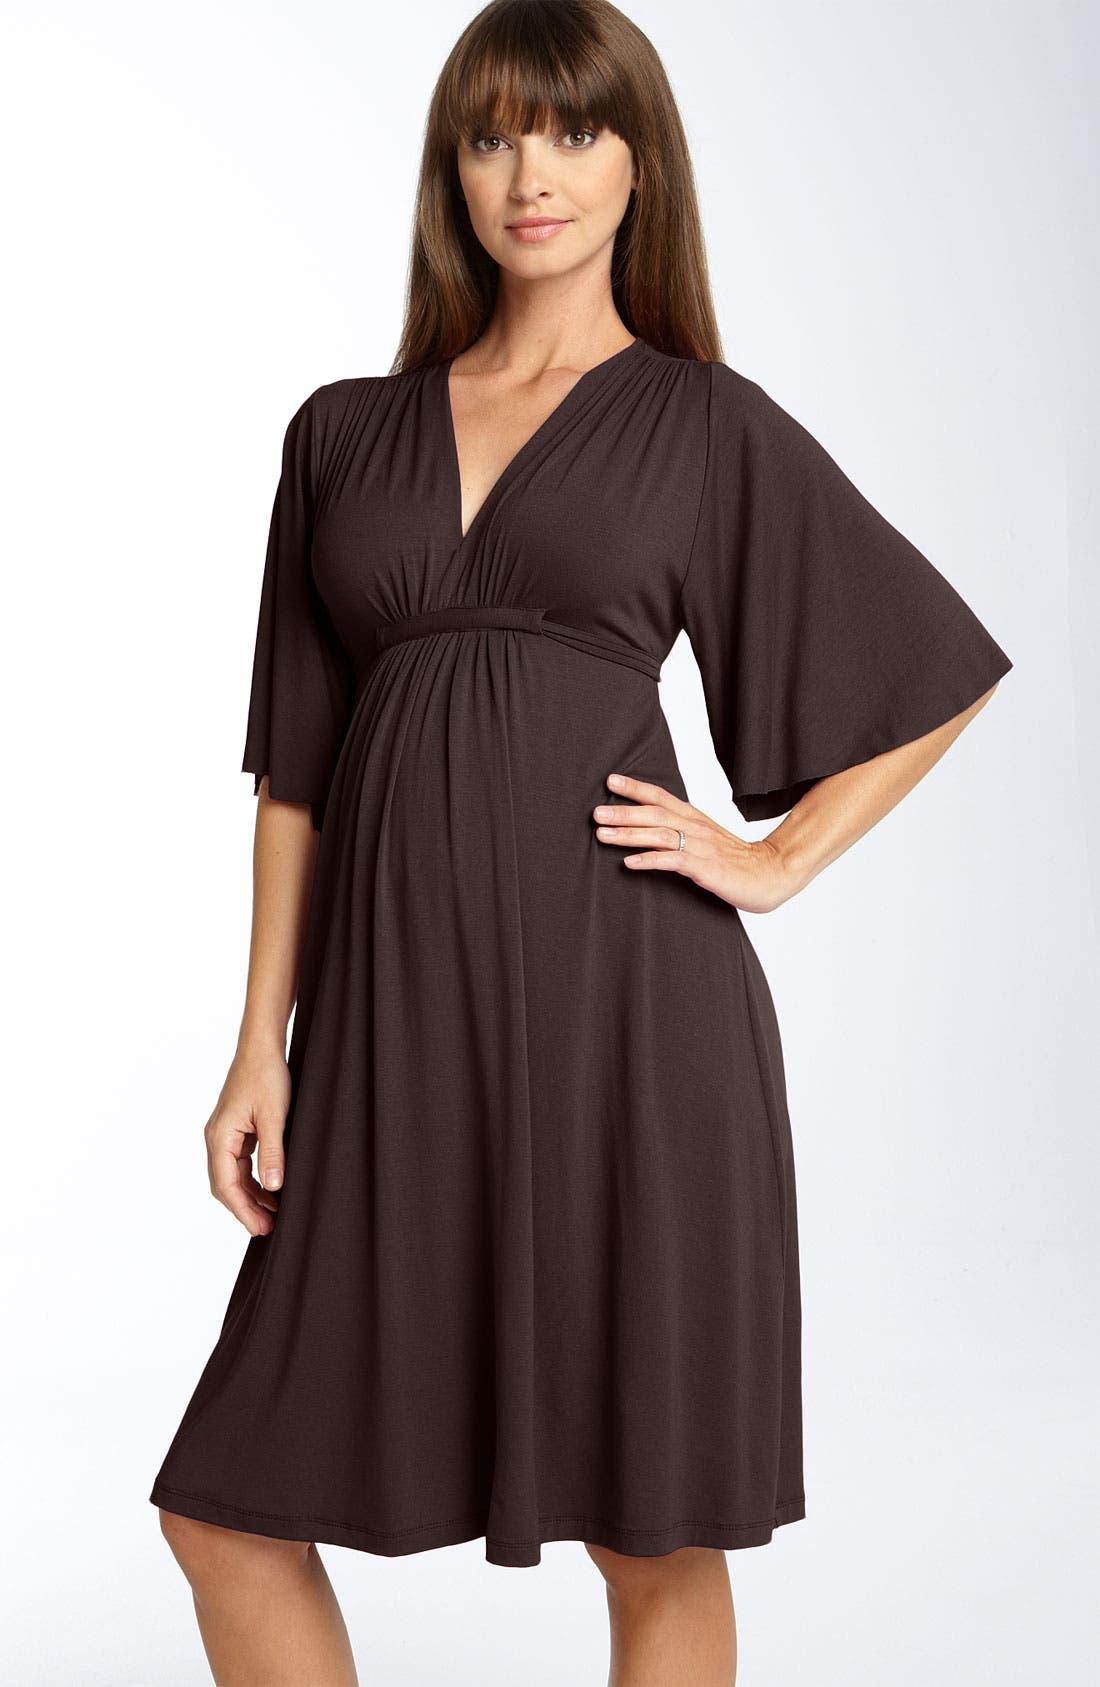 Empire Waist Maternity Dress,                             Main thumbnail 1, color,                             200